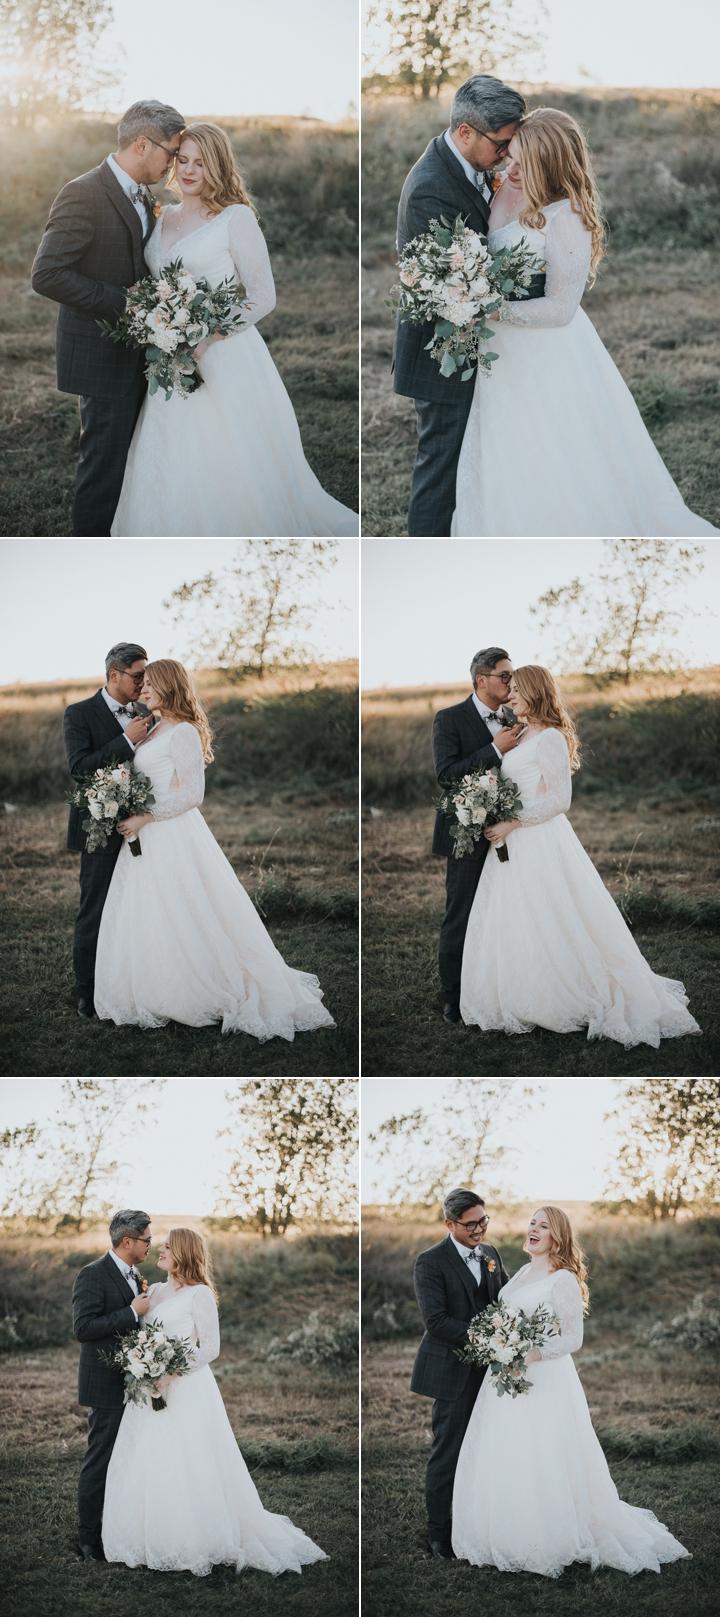 dallas-wedding-photographers-vb 17.jpg